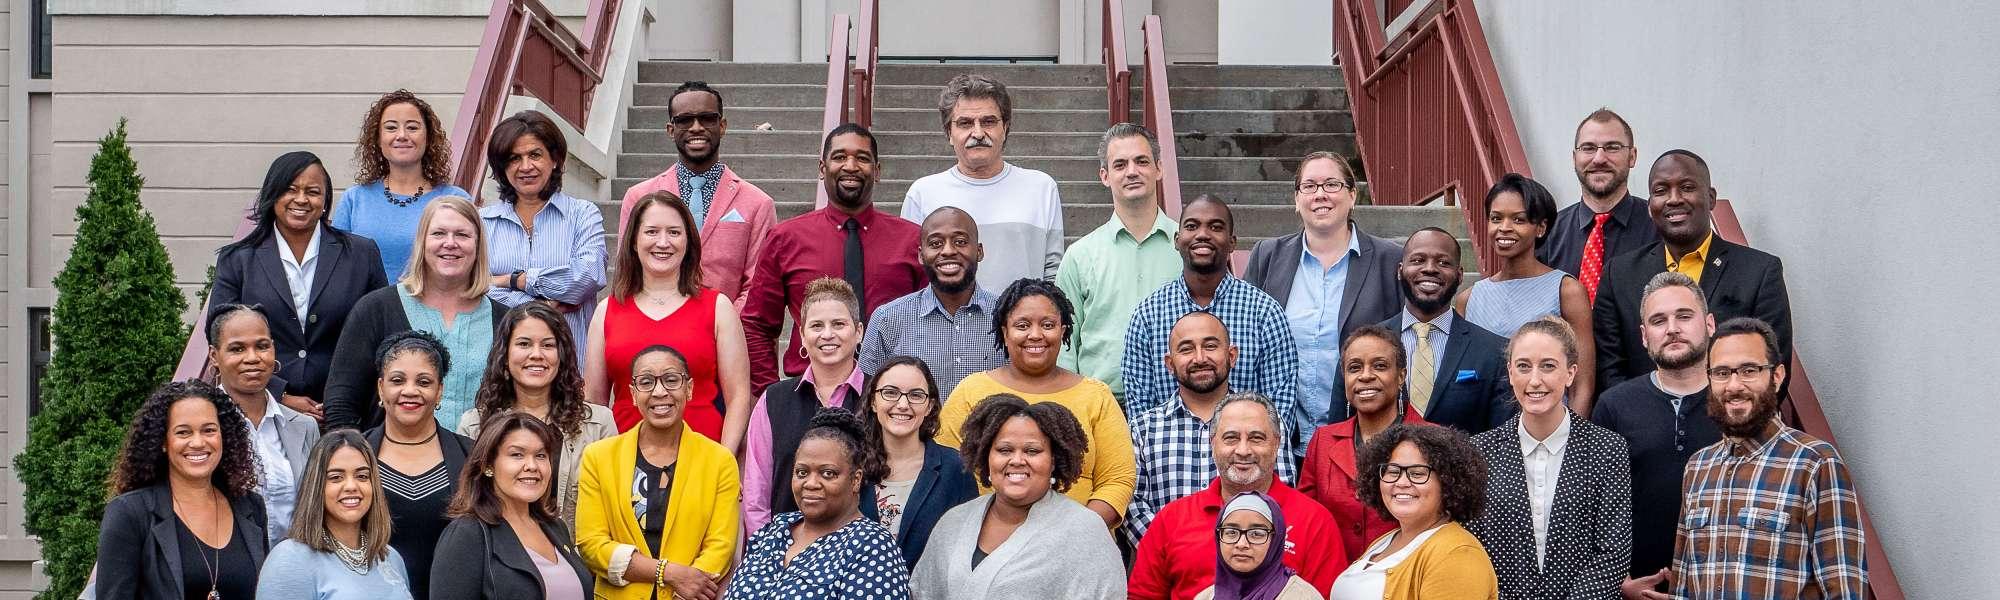 NJ Wellness Program (NJWELL) – Human Resources - Montclair